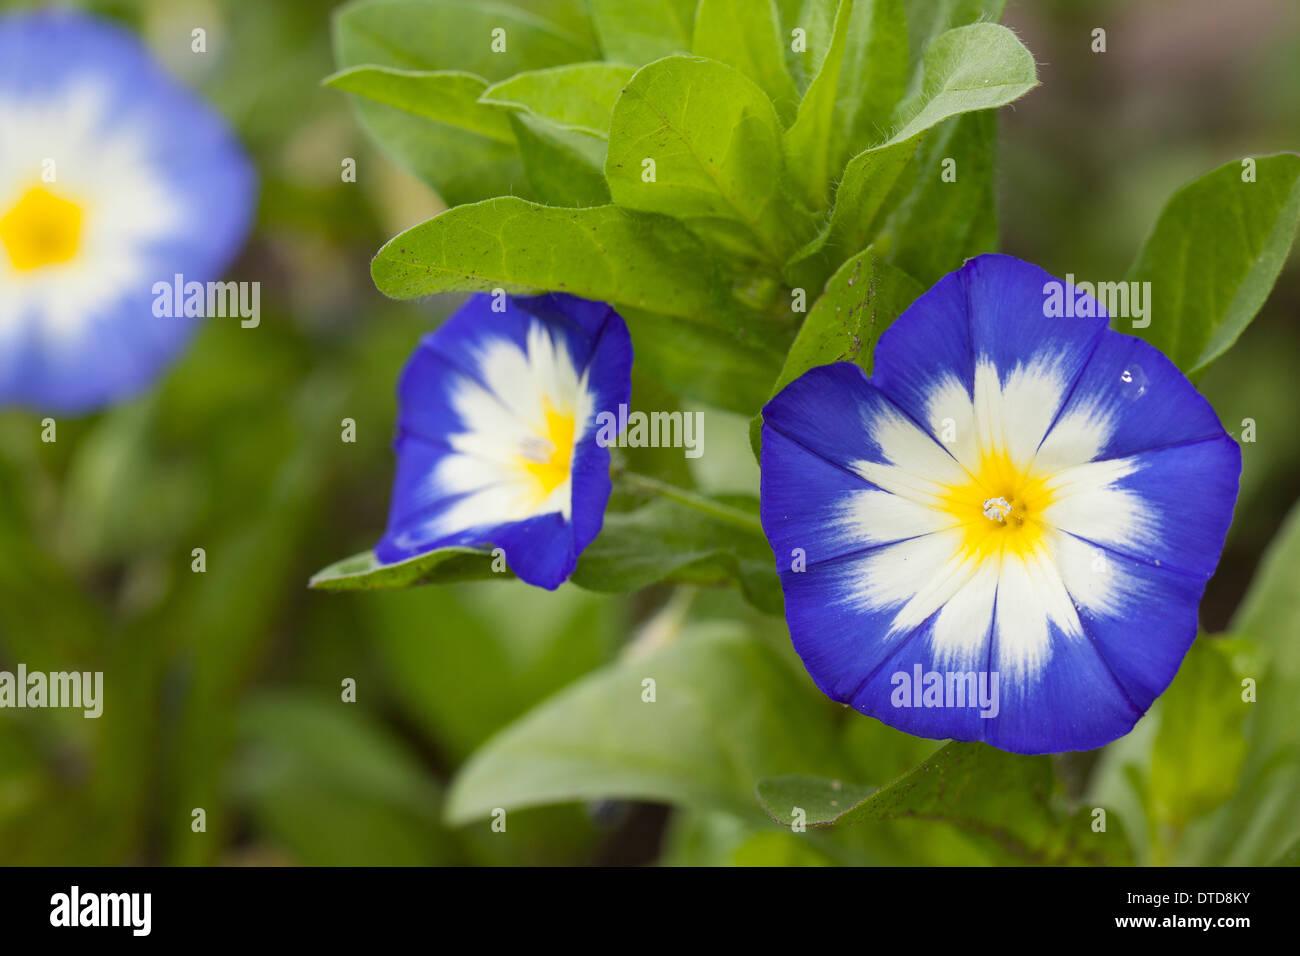 Dwarf Morning Glory, dwarf glory bind, Dreifarbige Winde, Zwerg-Trichterwinde, Convolvulus tricolor, Convolvulus minor - Stock Image